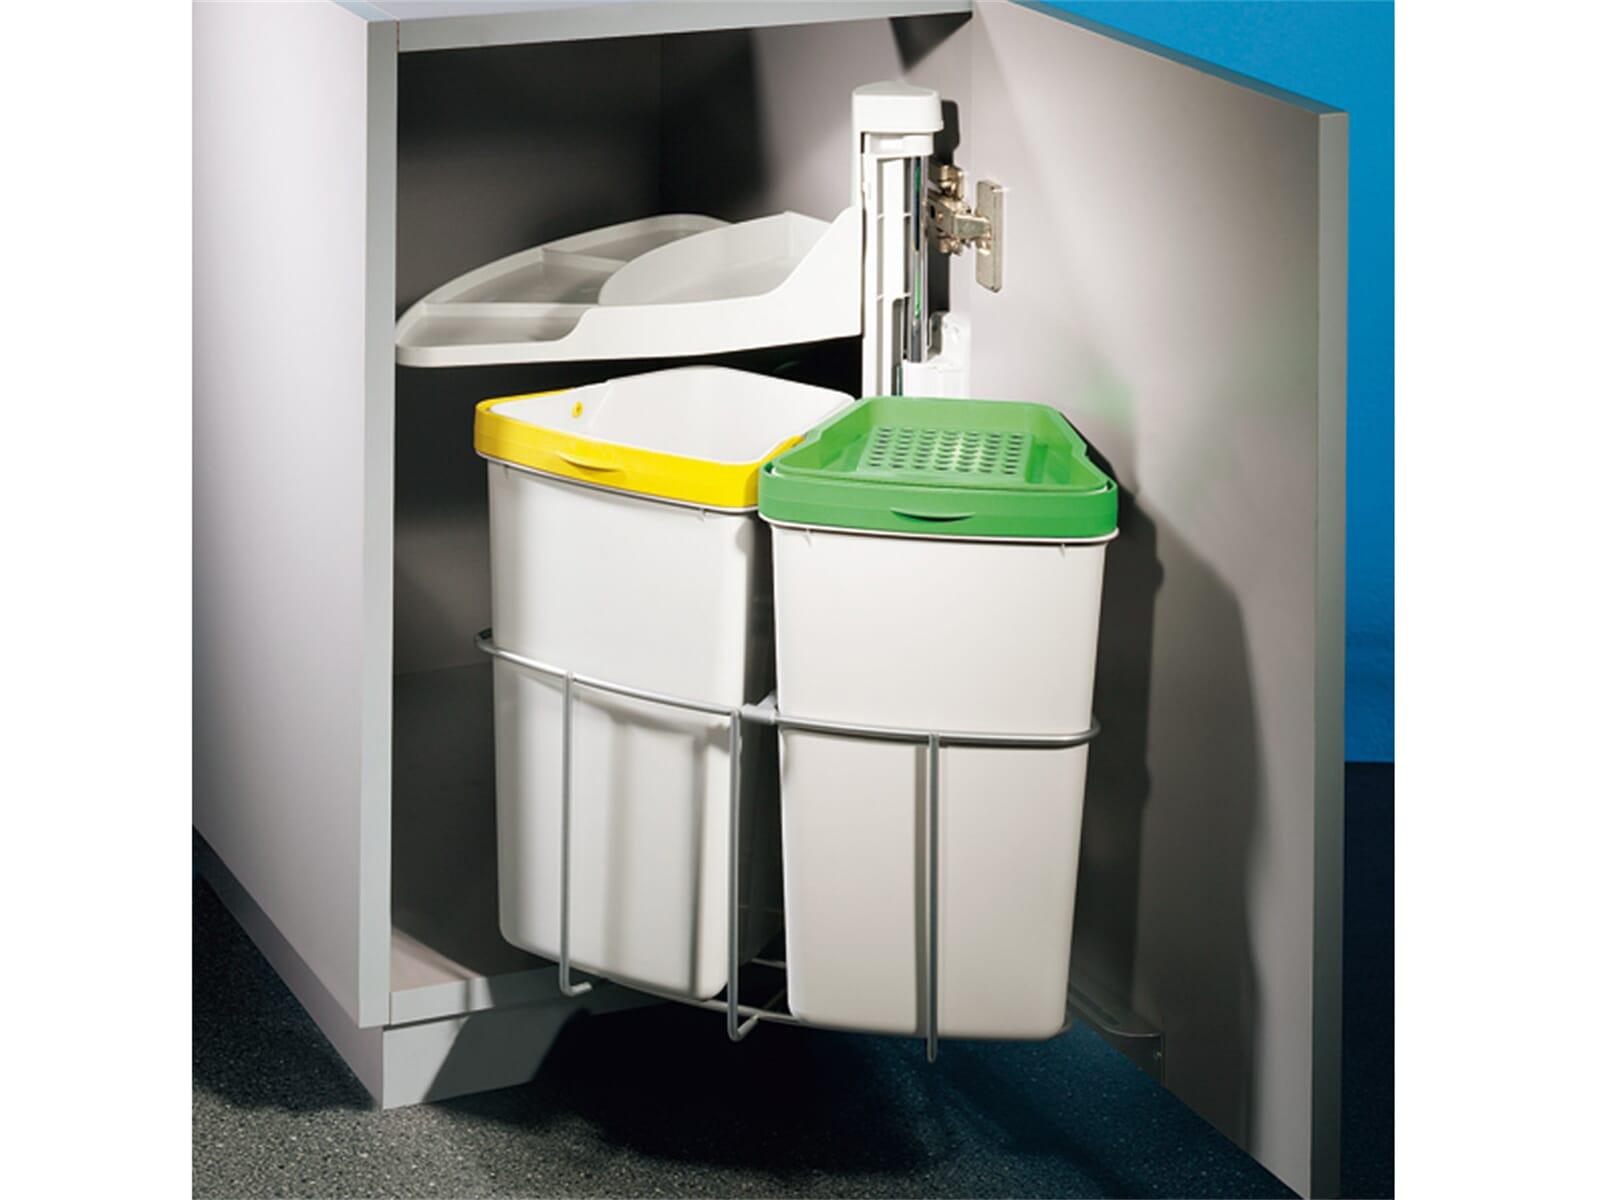 naber cabbi junior 2 plus einbau abfallsammler f r 78 90 eur. Black Bedroom Furniture Sets. Home Design Ideas